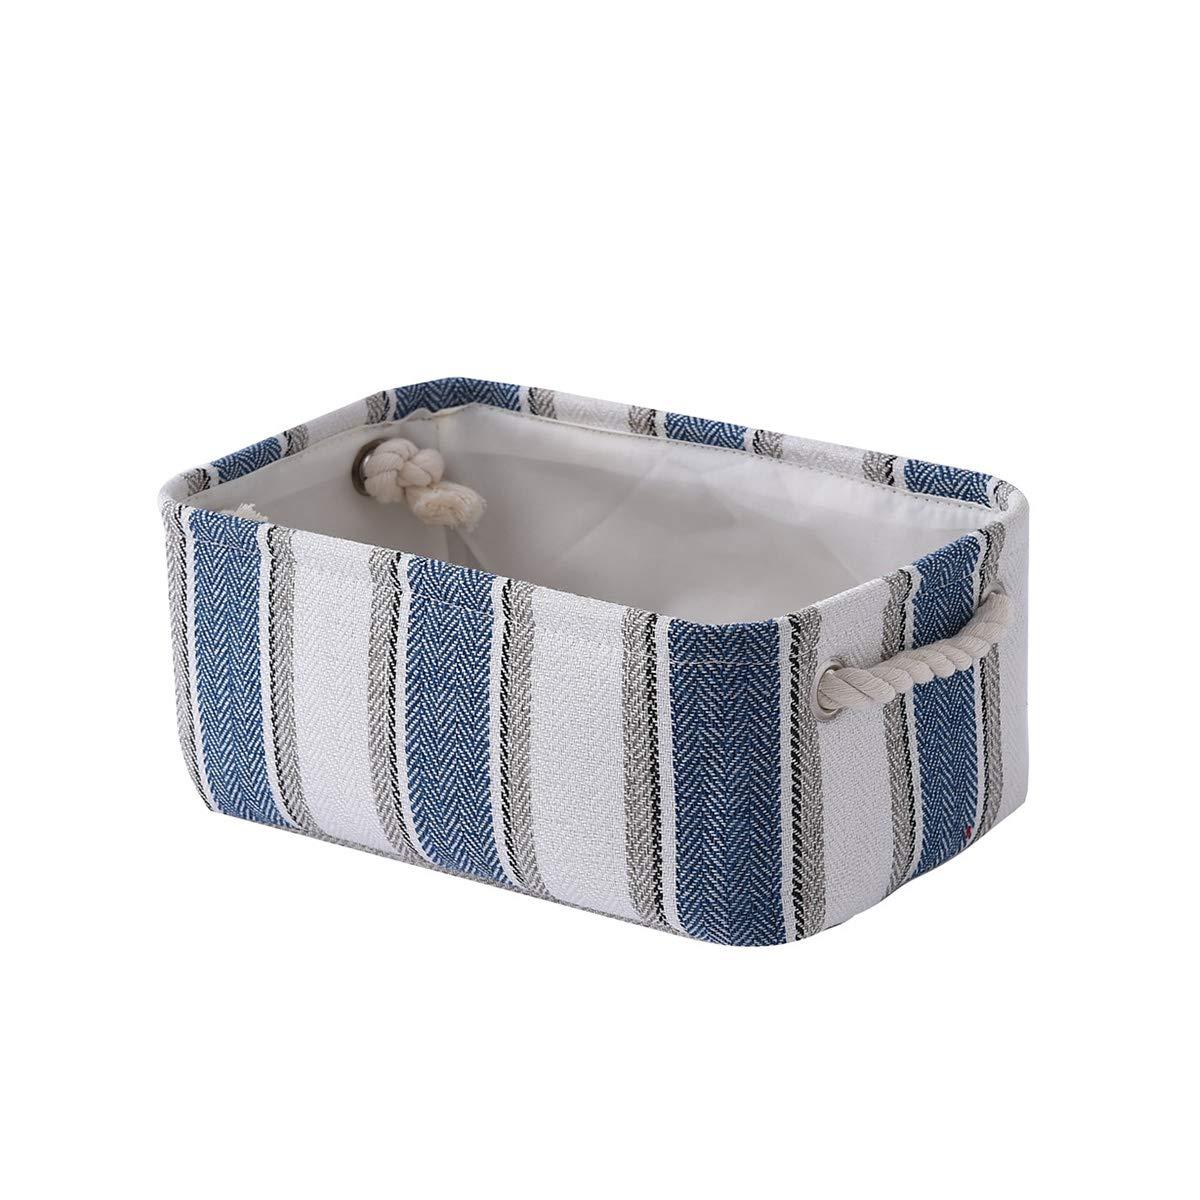 TheWarmHome Small Storage Basket Fabric Toy Basket Baby Storage Basket Dog Toy Basket Decorative Basket Cloth Storage Bin Empty Gift Basket for Book,Baby Toys Blue White Strip, 11.8L 7.9W 5.2H inch